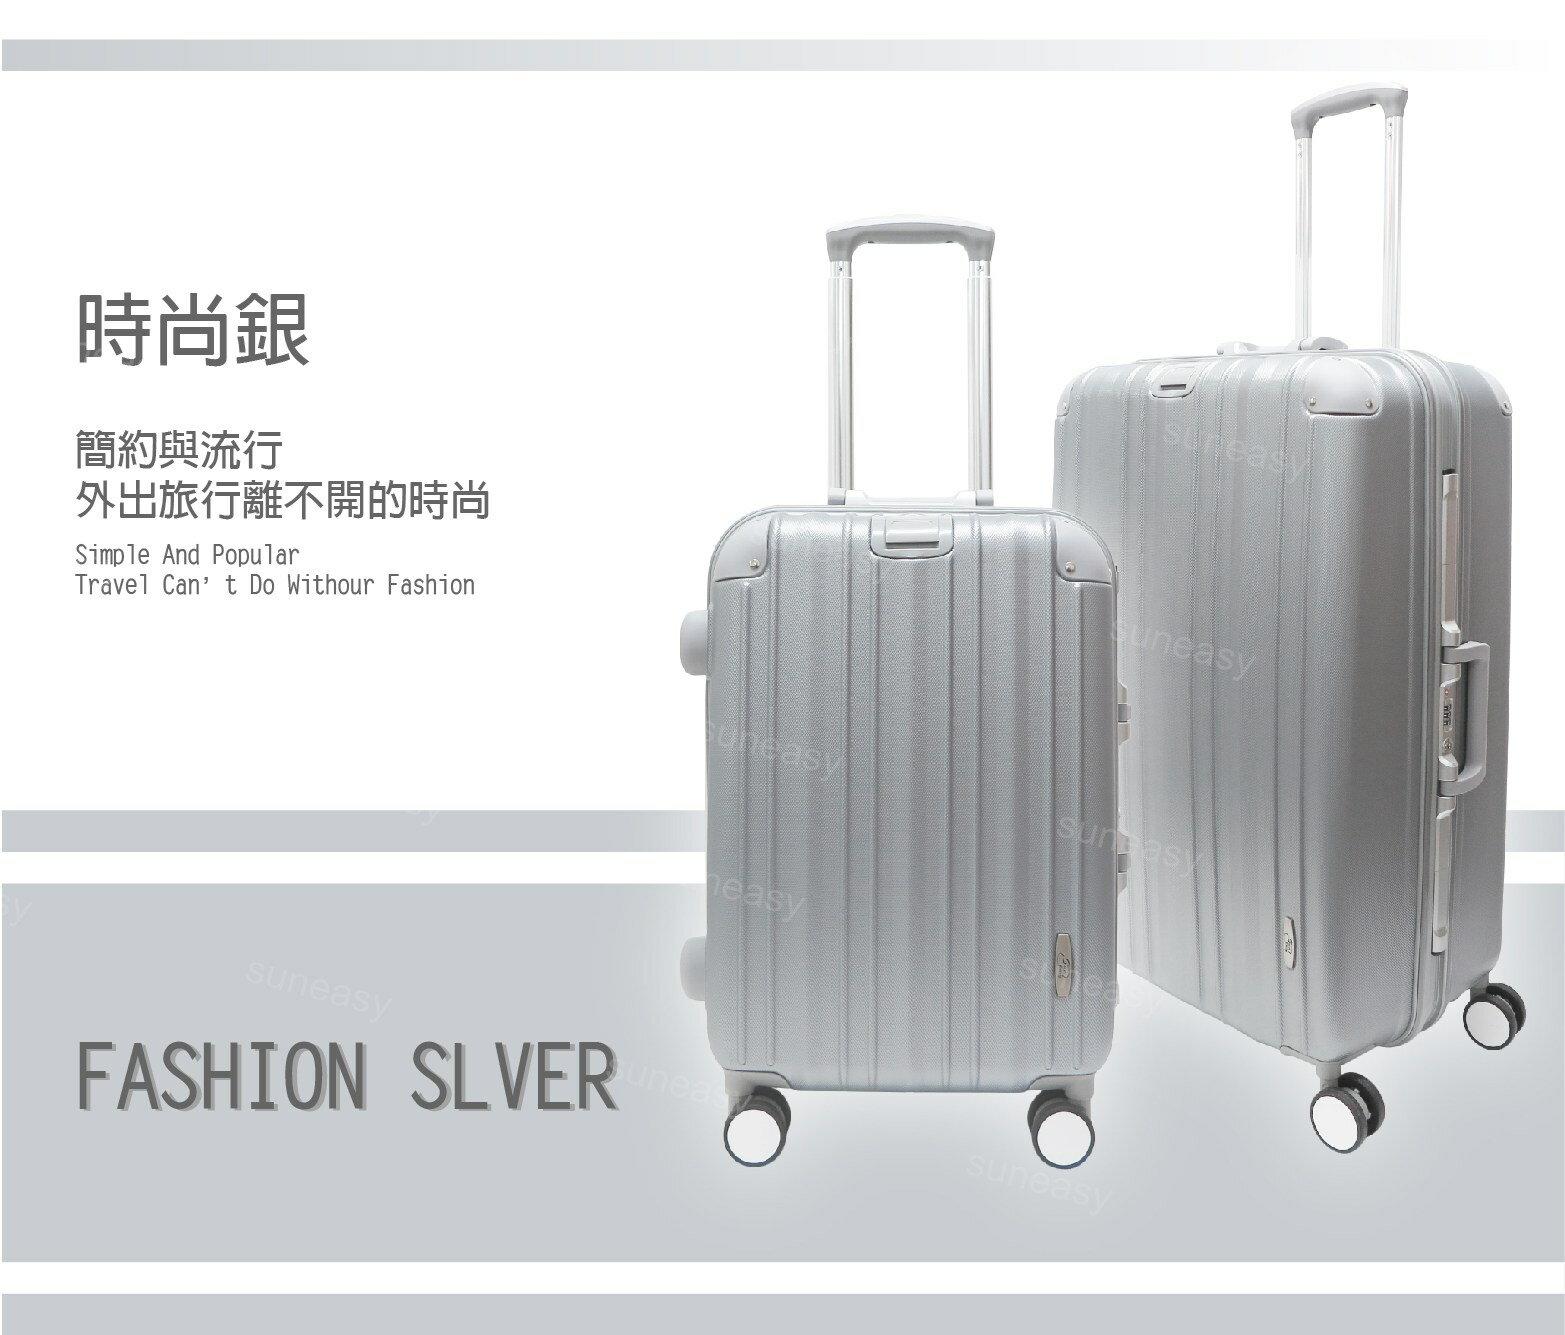 【SunEasy生活館】福利品~Suneasy奢華時尚鋁框行李箱28吋〈全新進化版〉/硬殼/海關鎖/鋁拉桿/大白輪